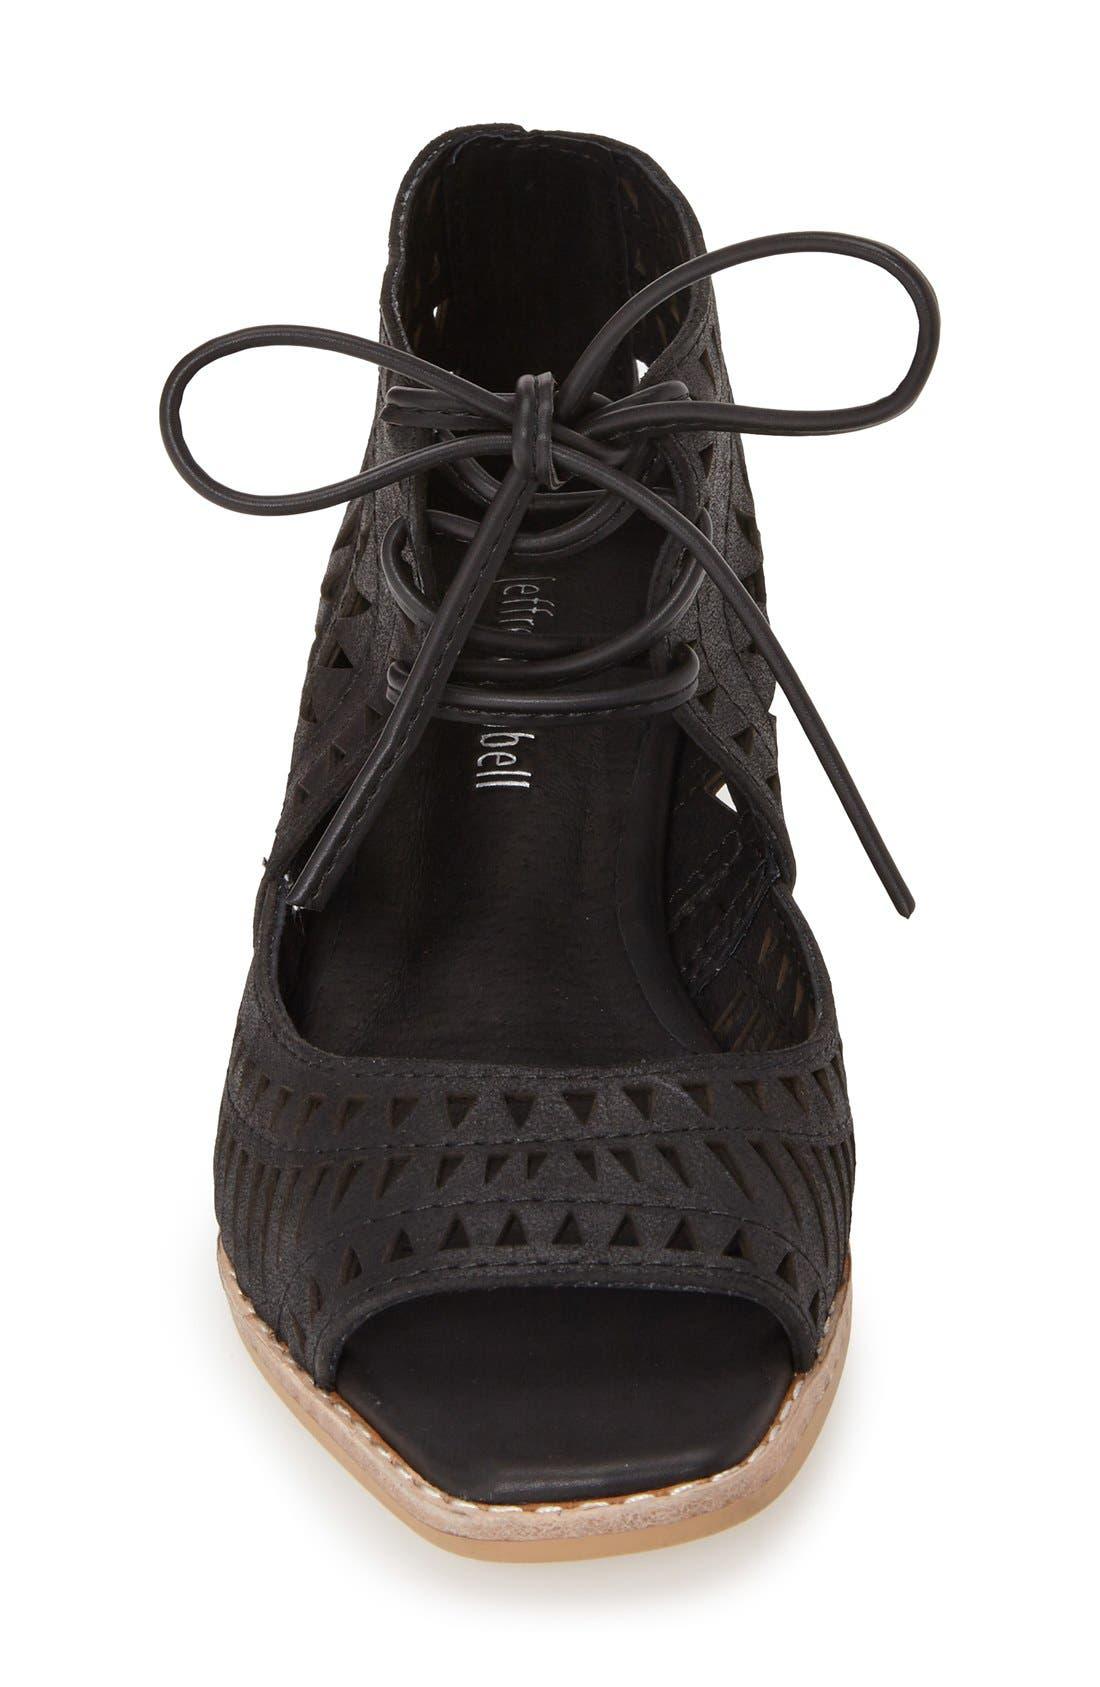 'Rodillo' Wedge Sandal,                             Alternate thumbnail 3, color,                             BLACK LEATHER